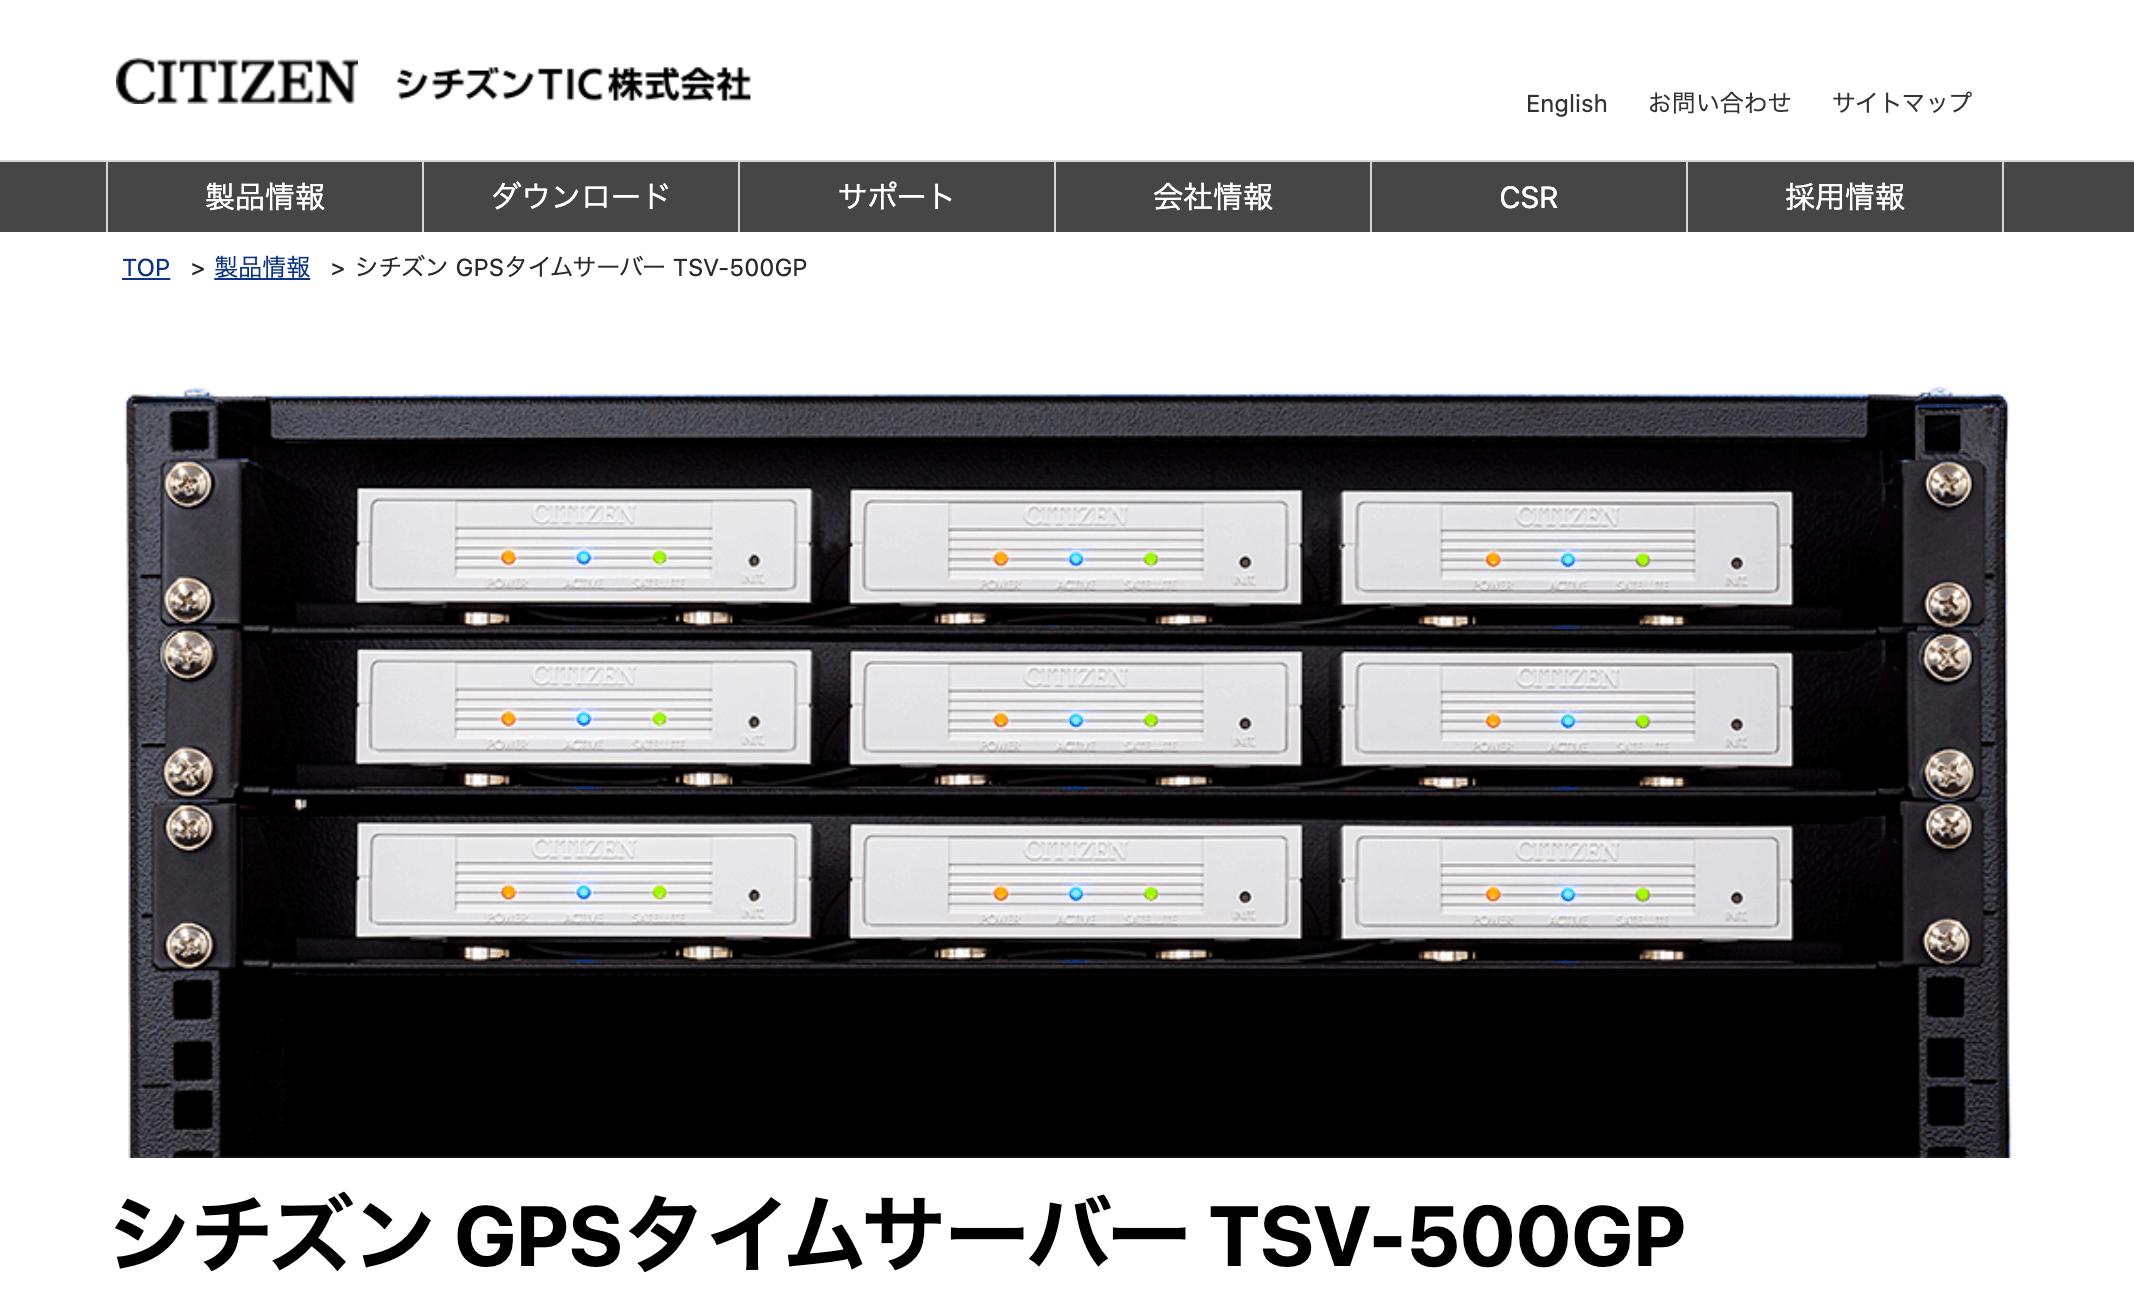 GPSタイムサーバー TSV-500GP